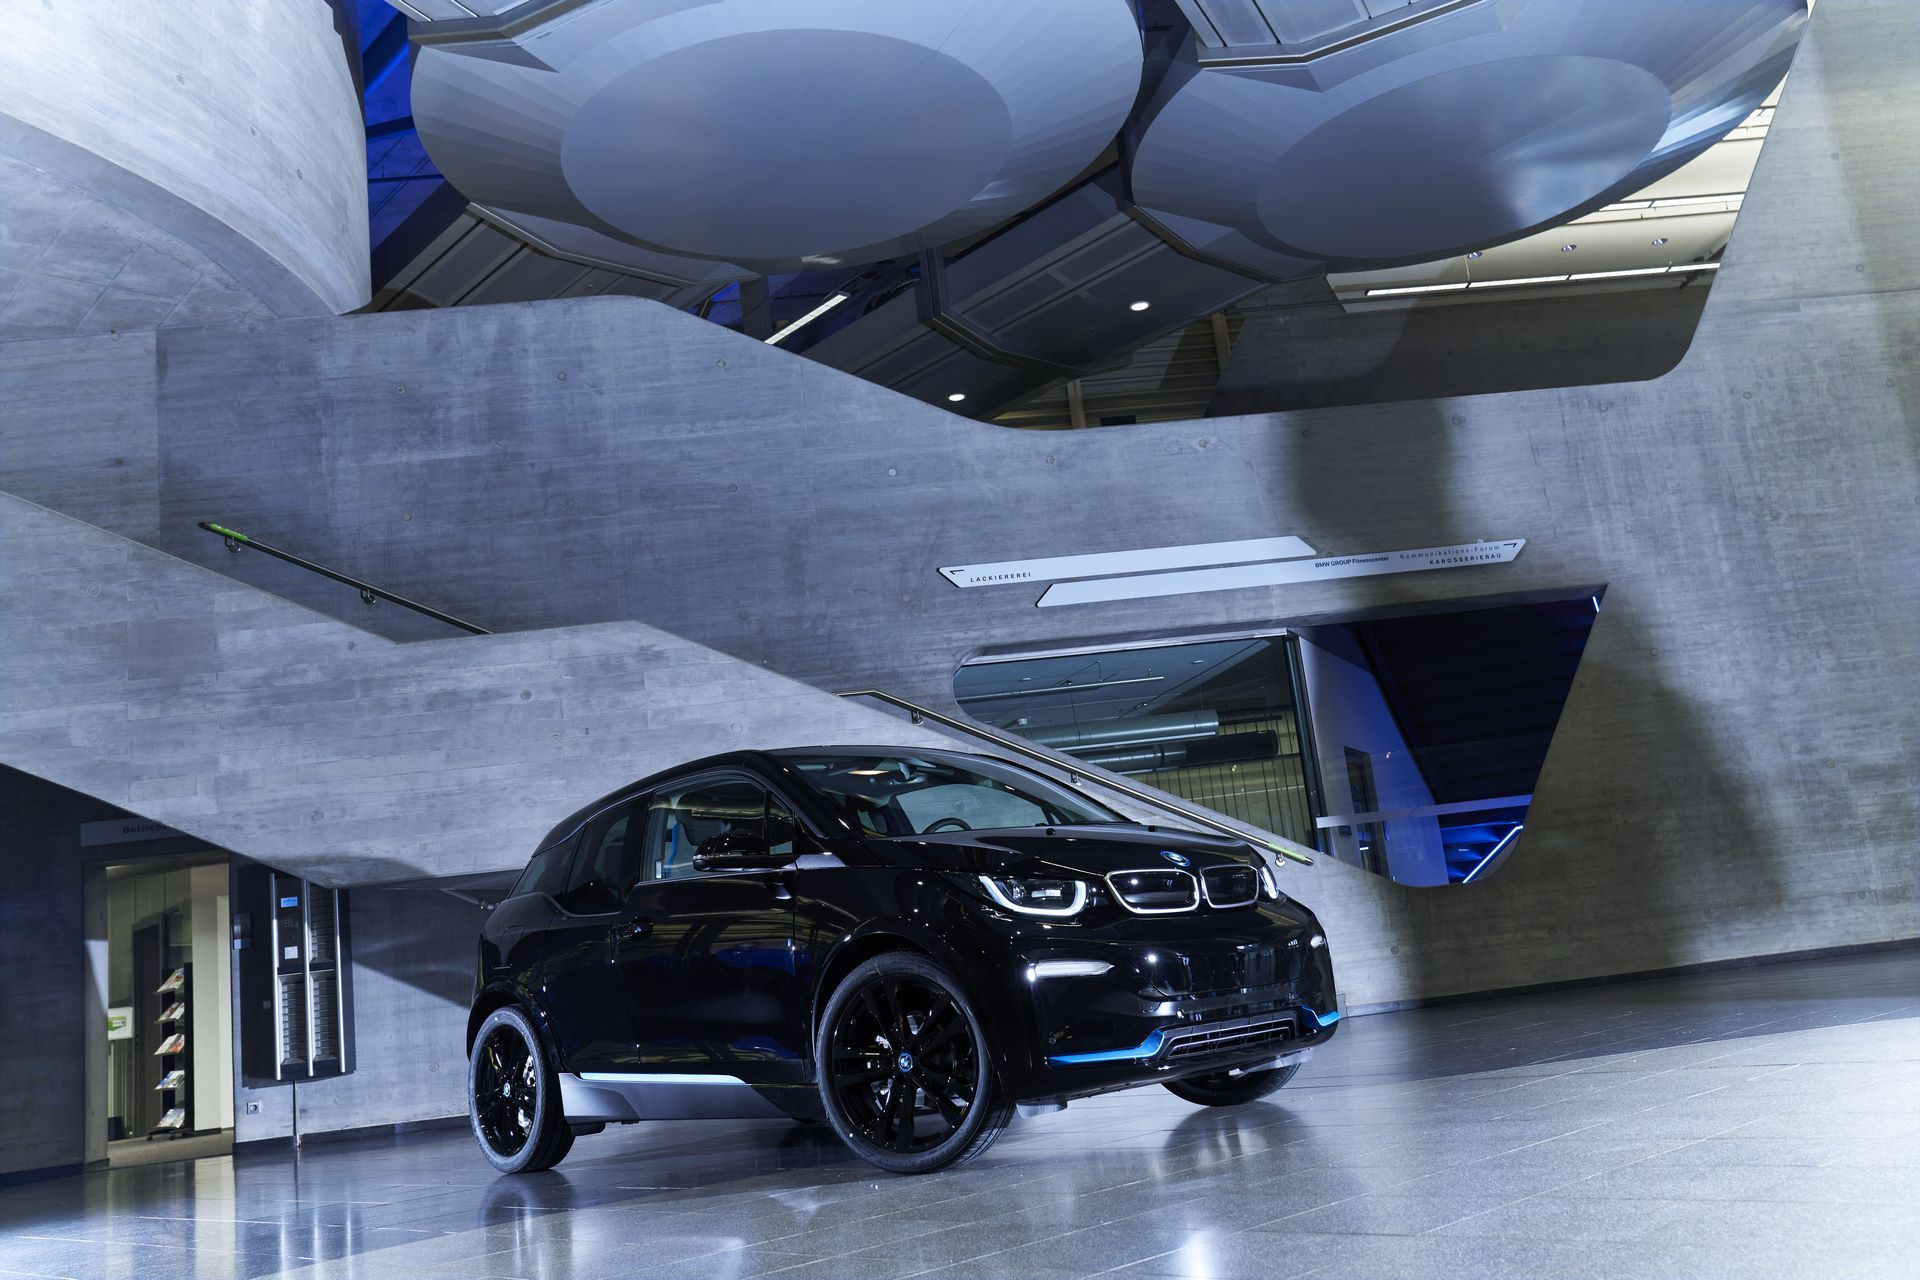 BMW-i8-plant-production-77